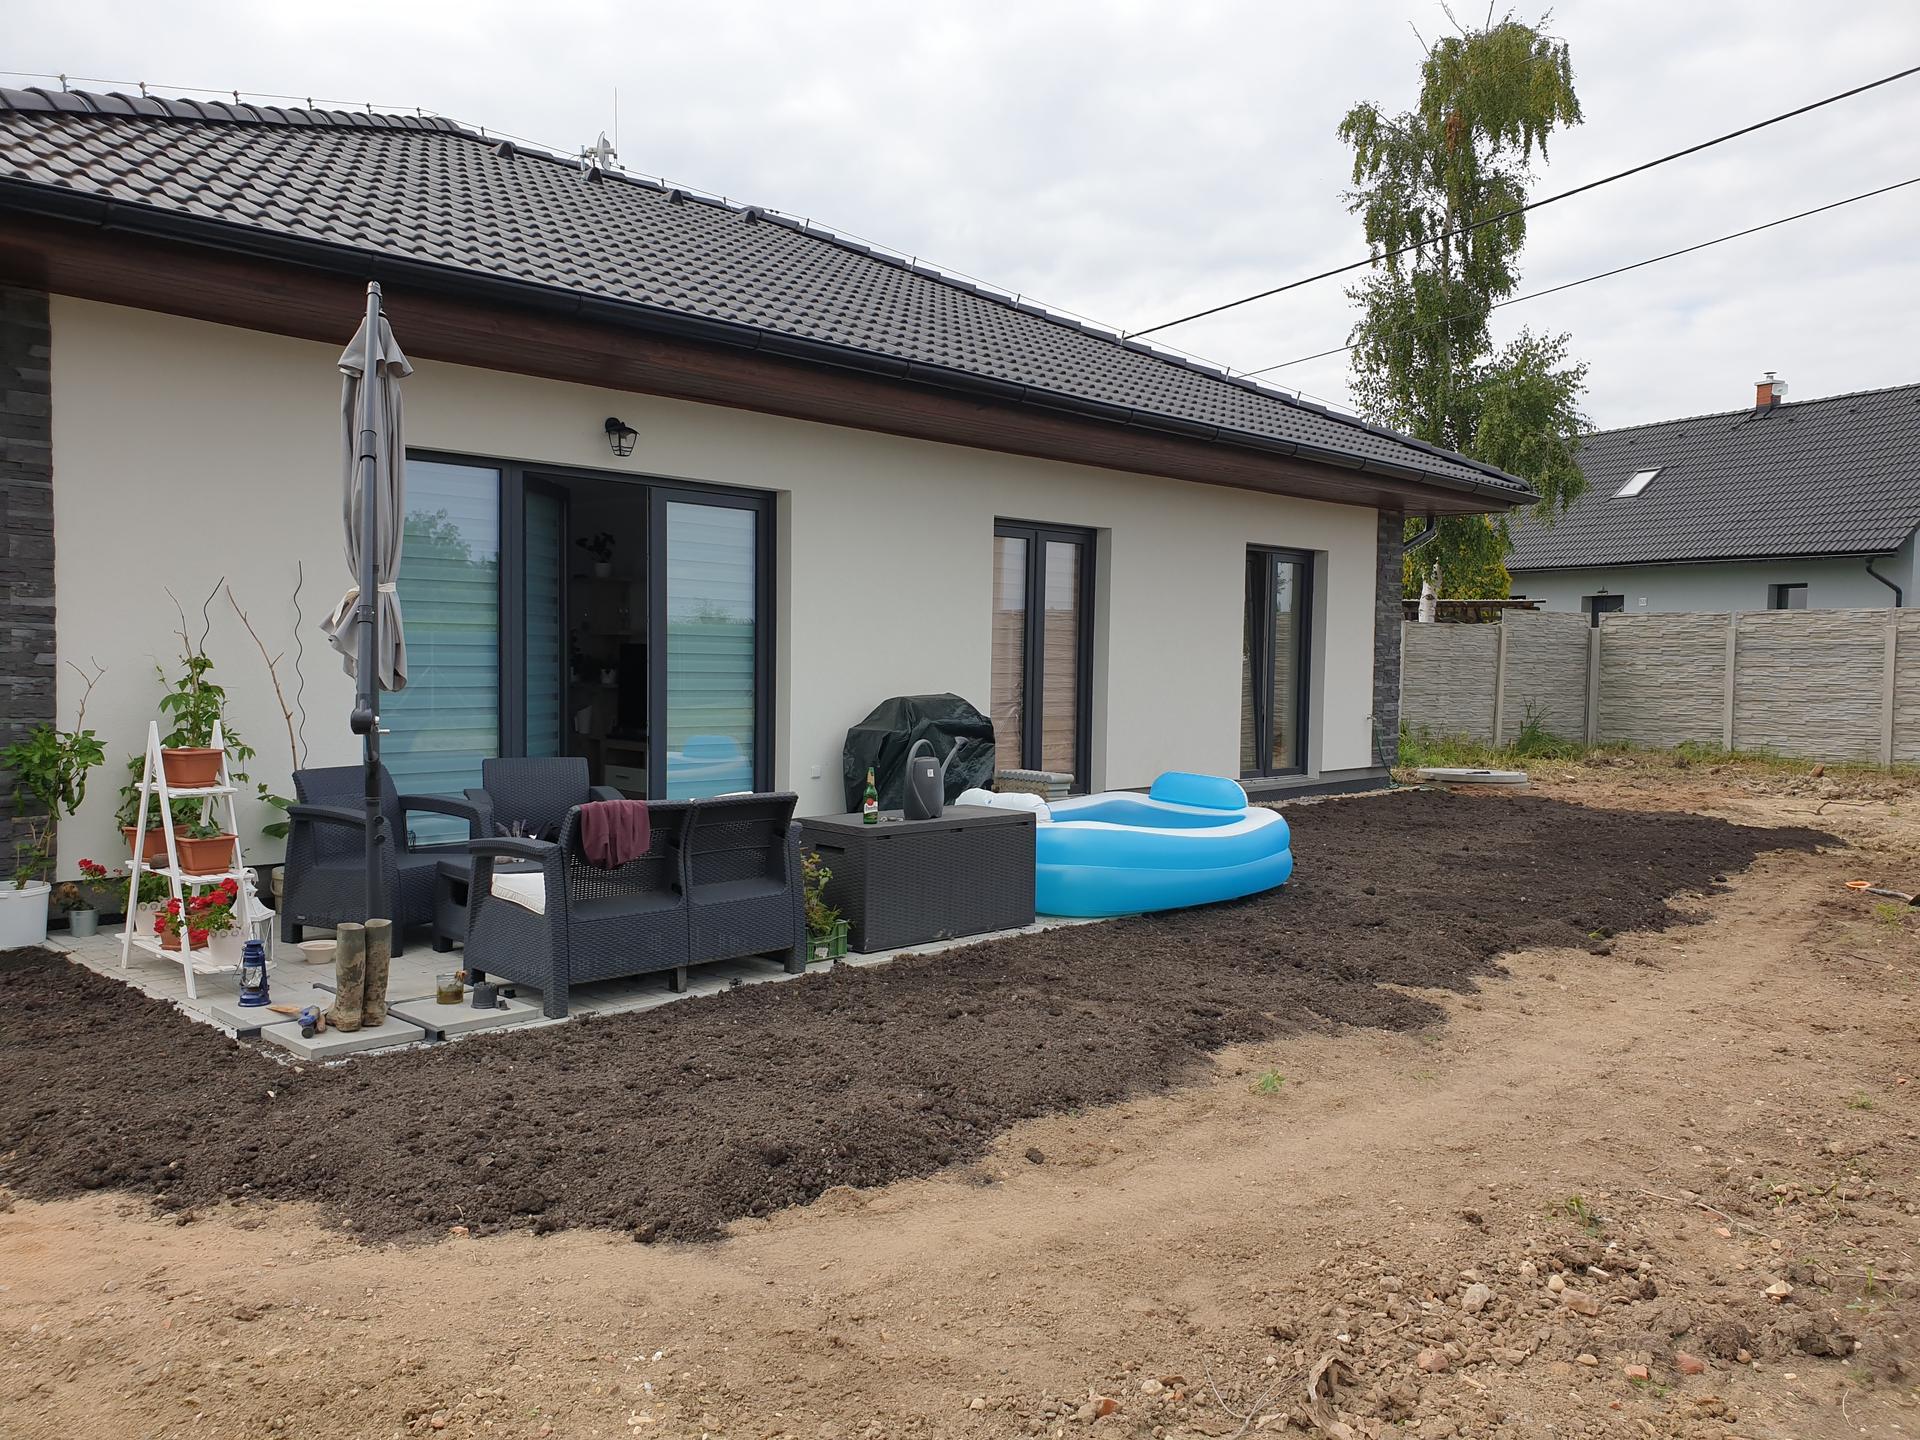 Zahrada a terasa - Obrázek č. 47